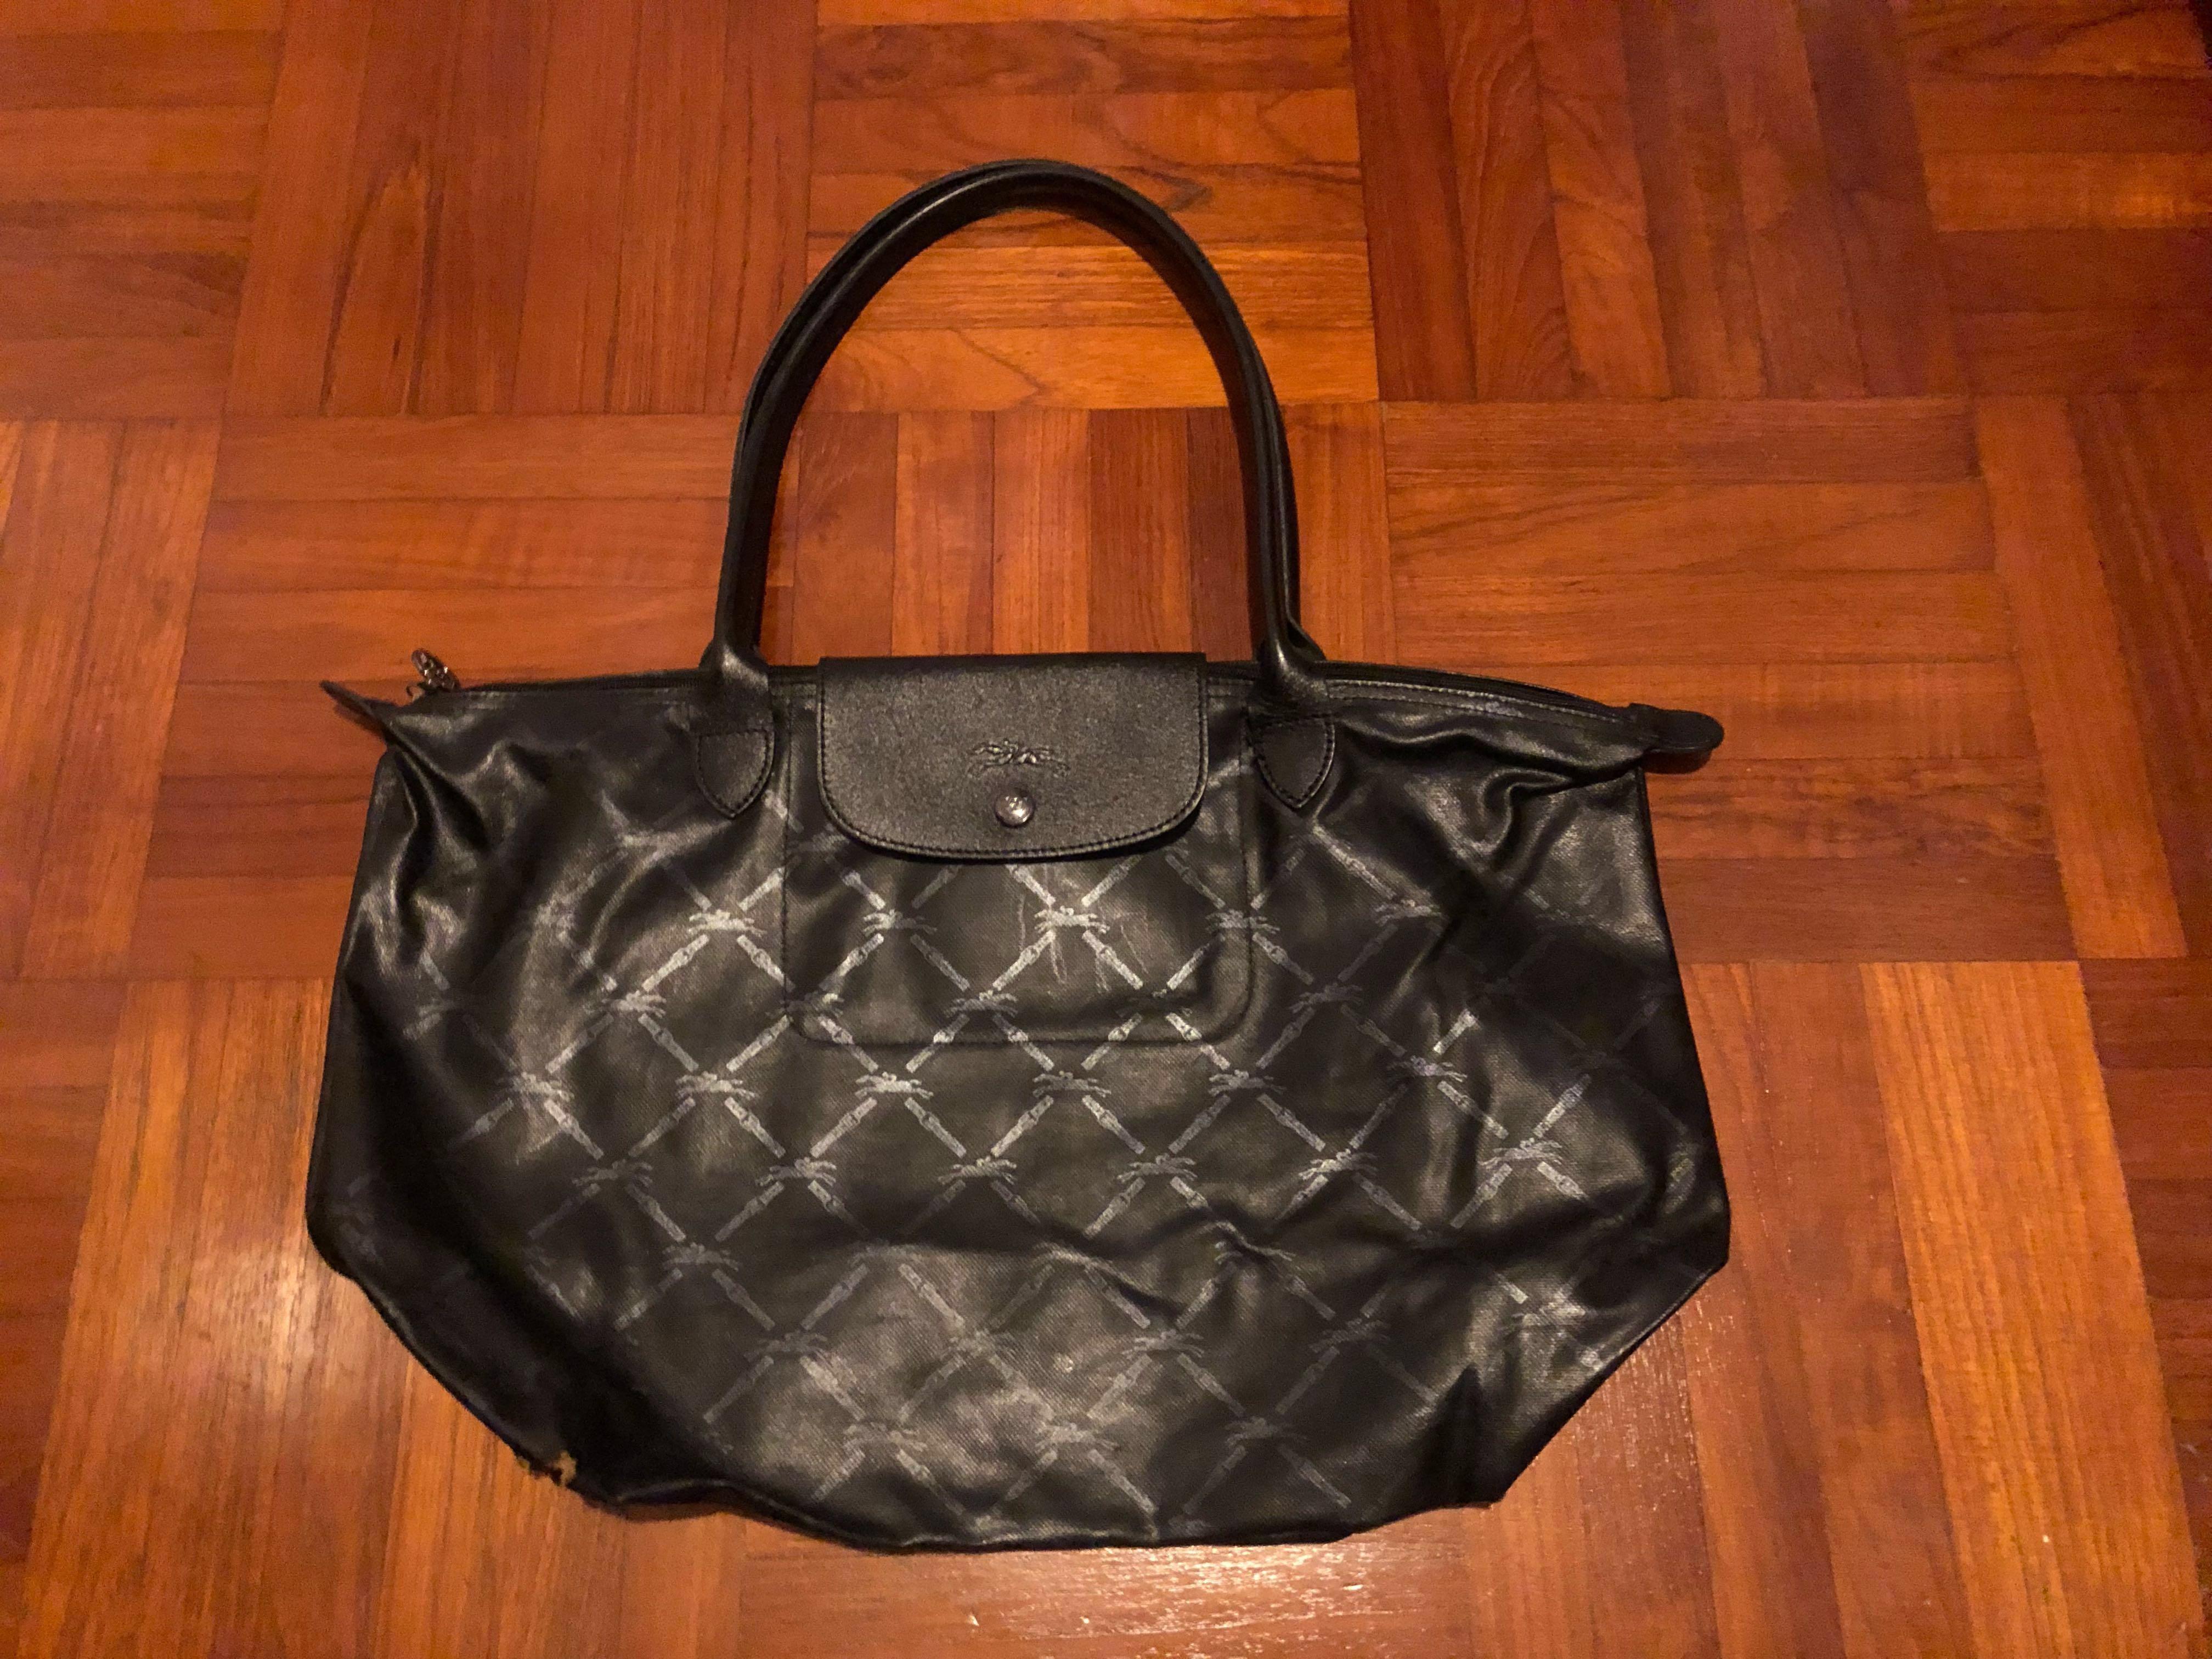 Longchamp Black Le Pliage Bag, Women s Fashion, Bags   Wallets, Handbags on  Carousell 725bfc3c80